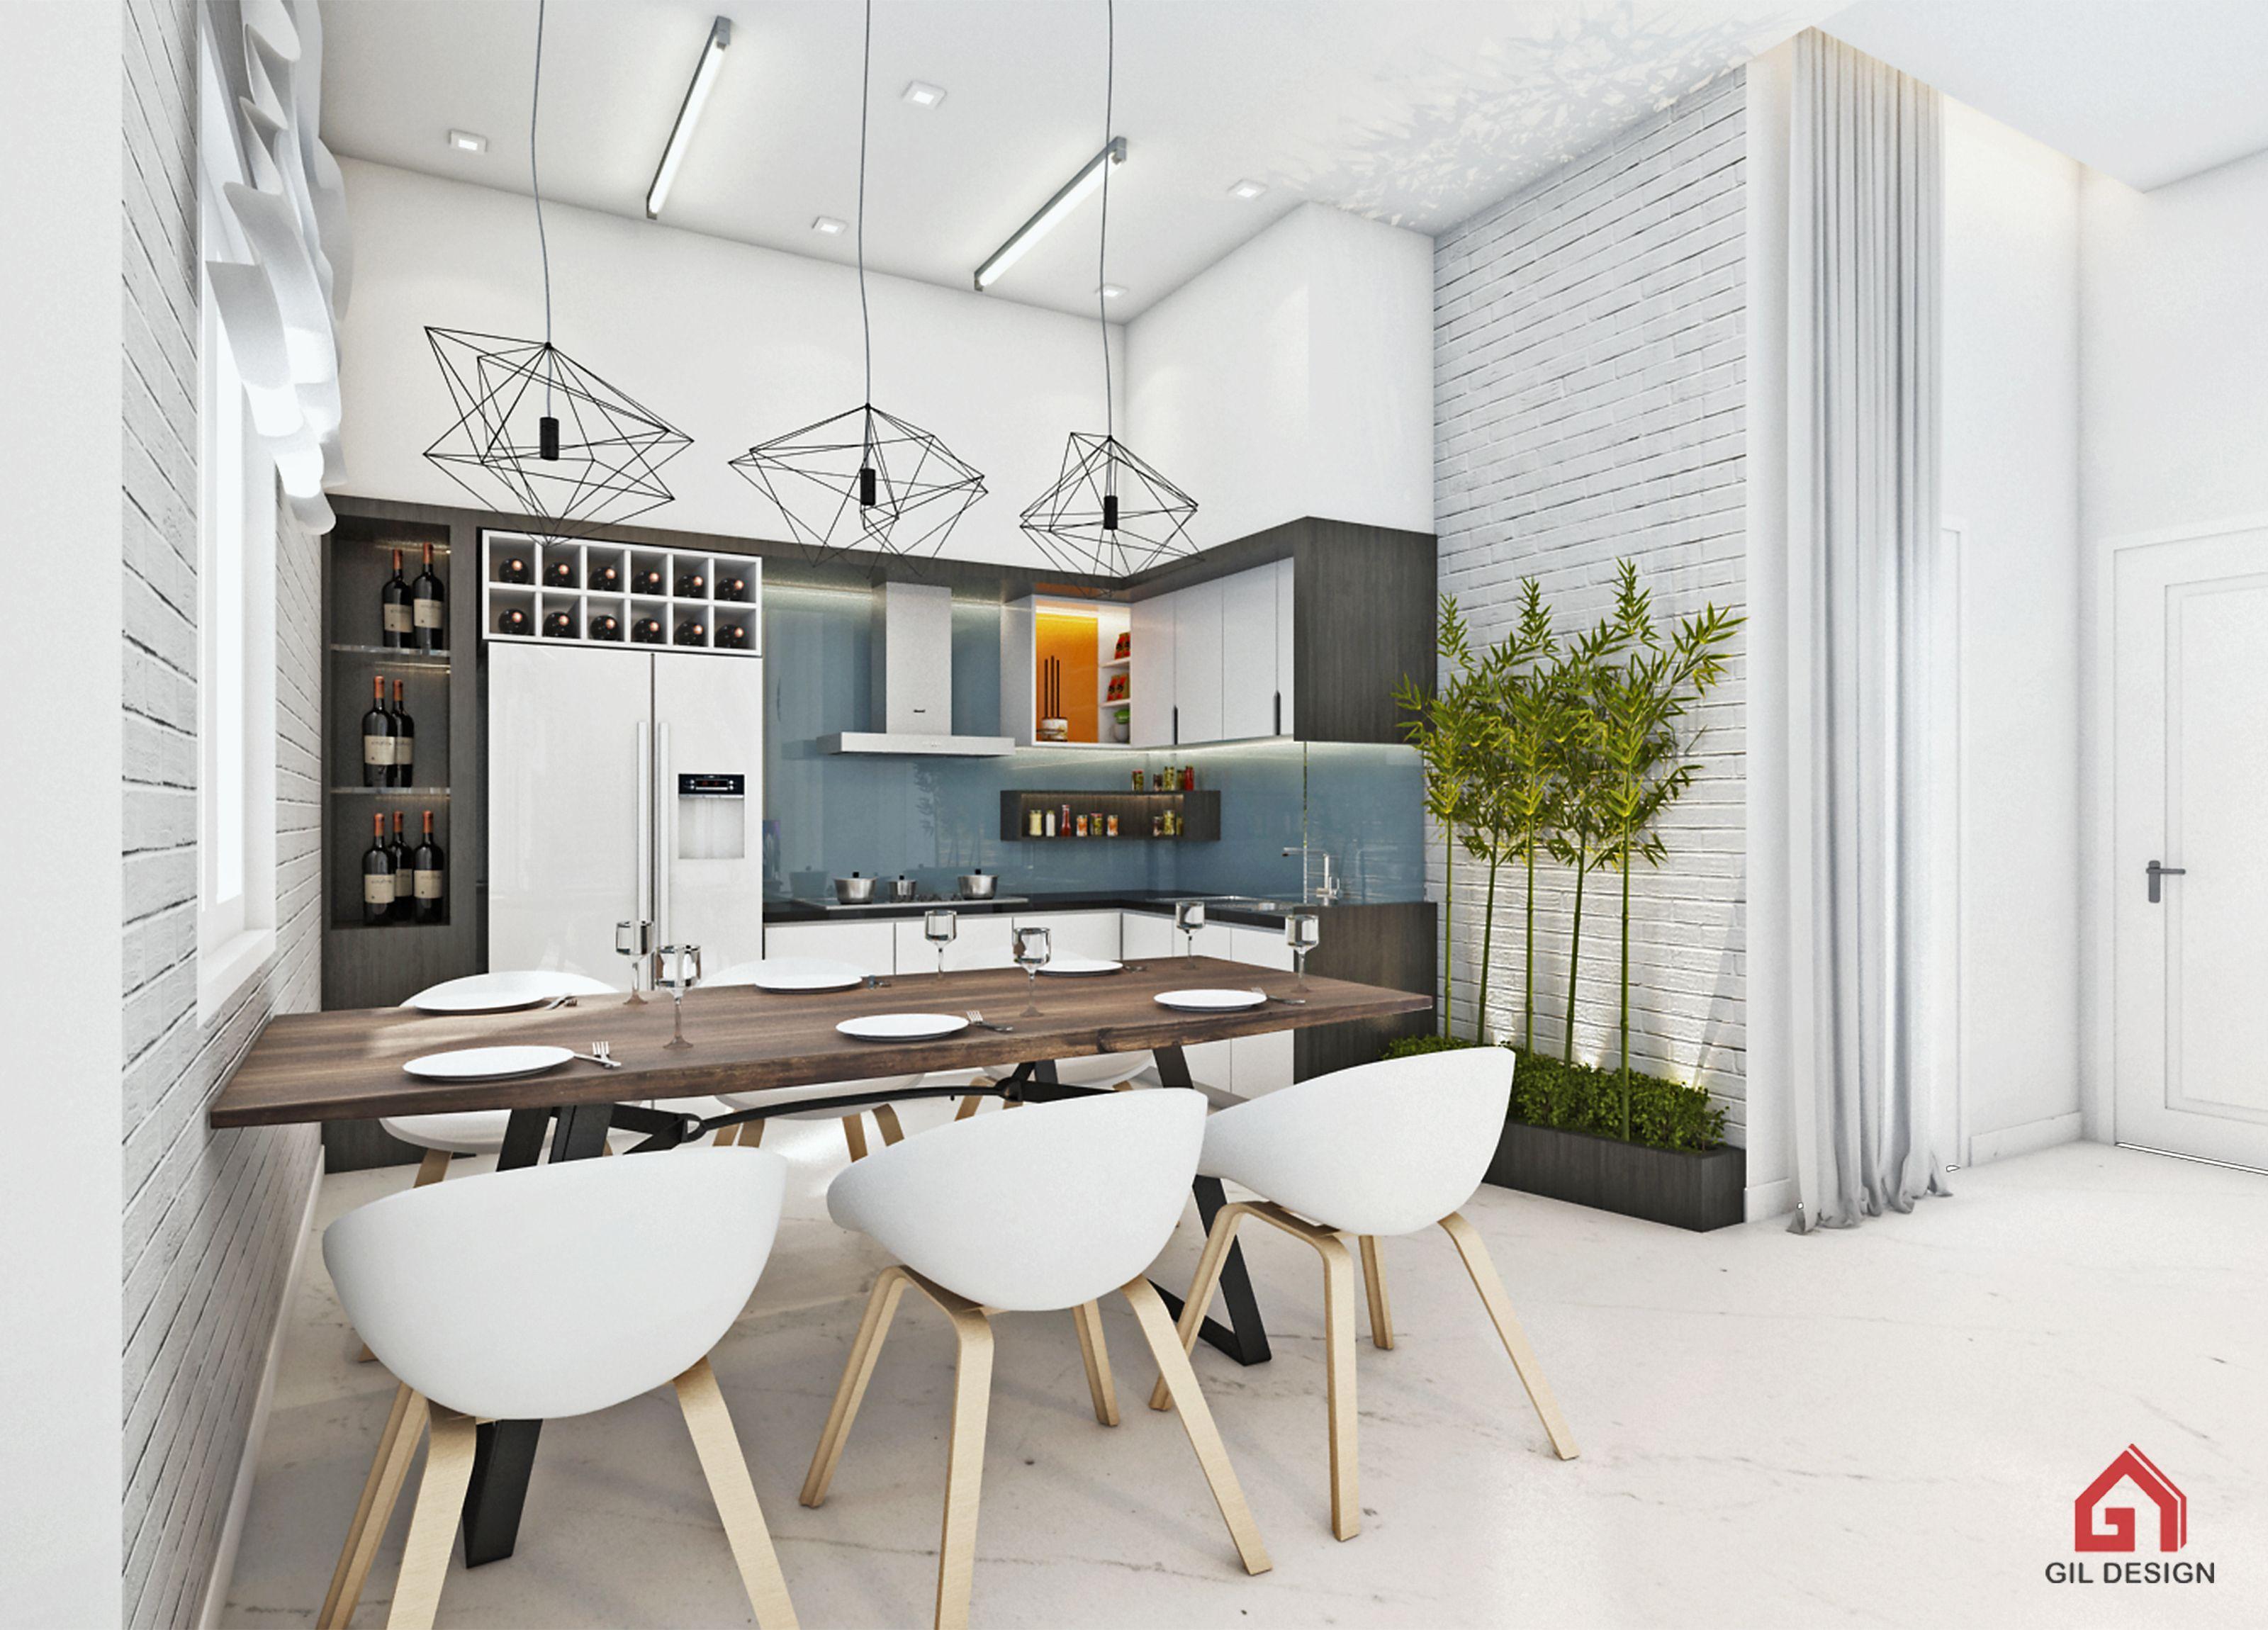 Modern Kitchen. Ho Chi Minh City, Vietnam. Designed by Gil Design. Gildesign.vn